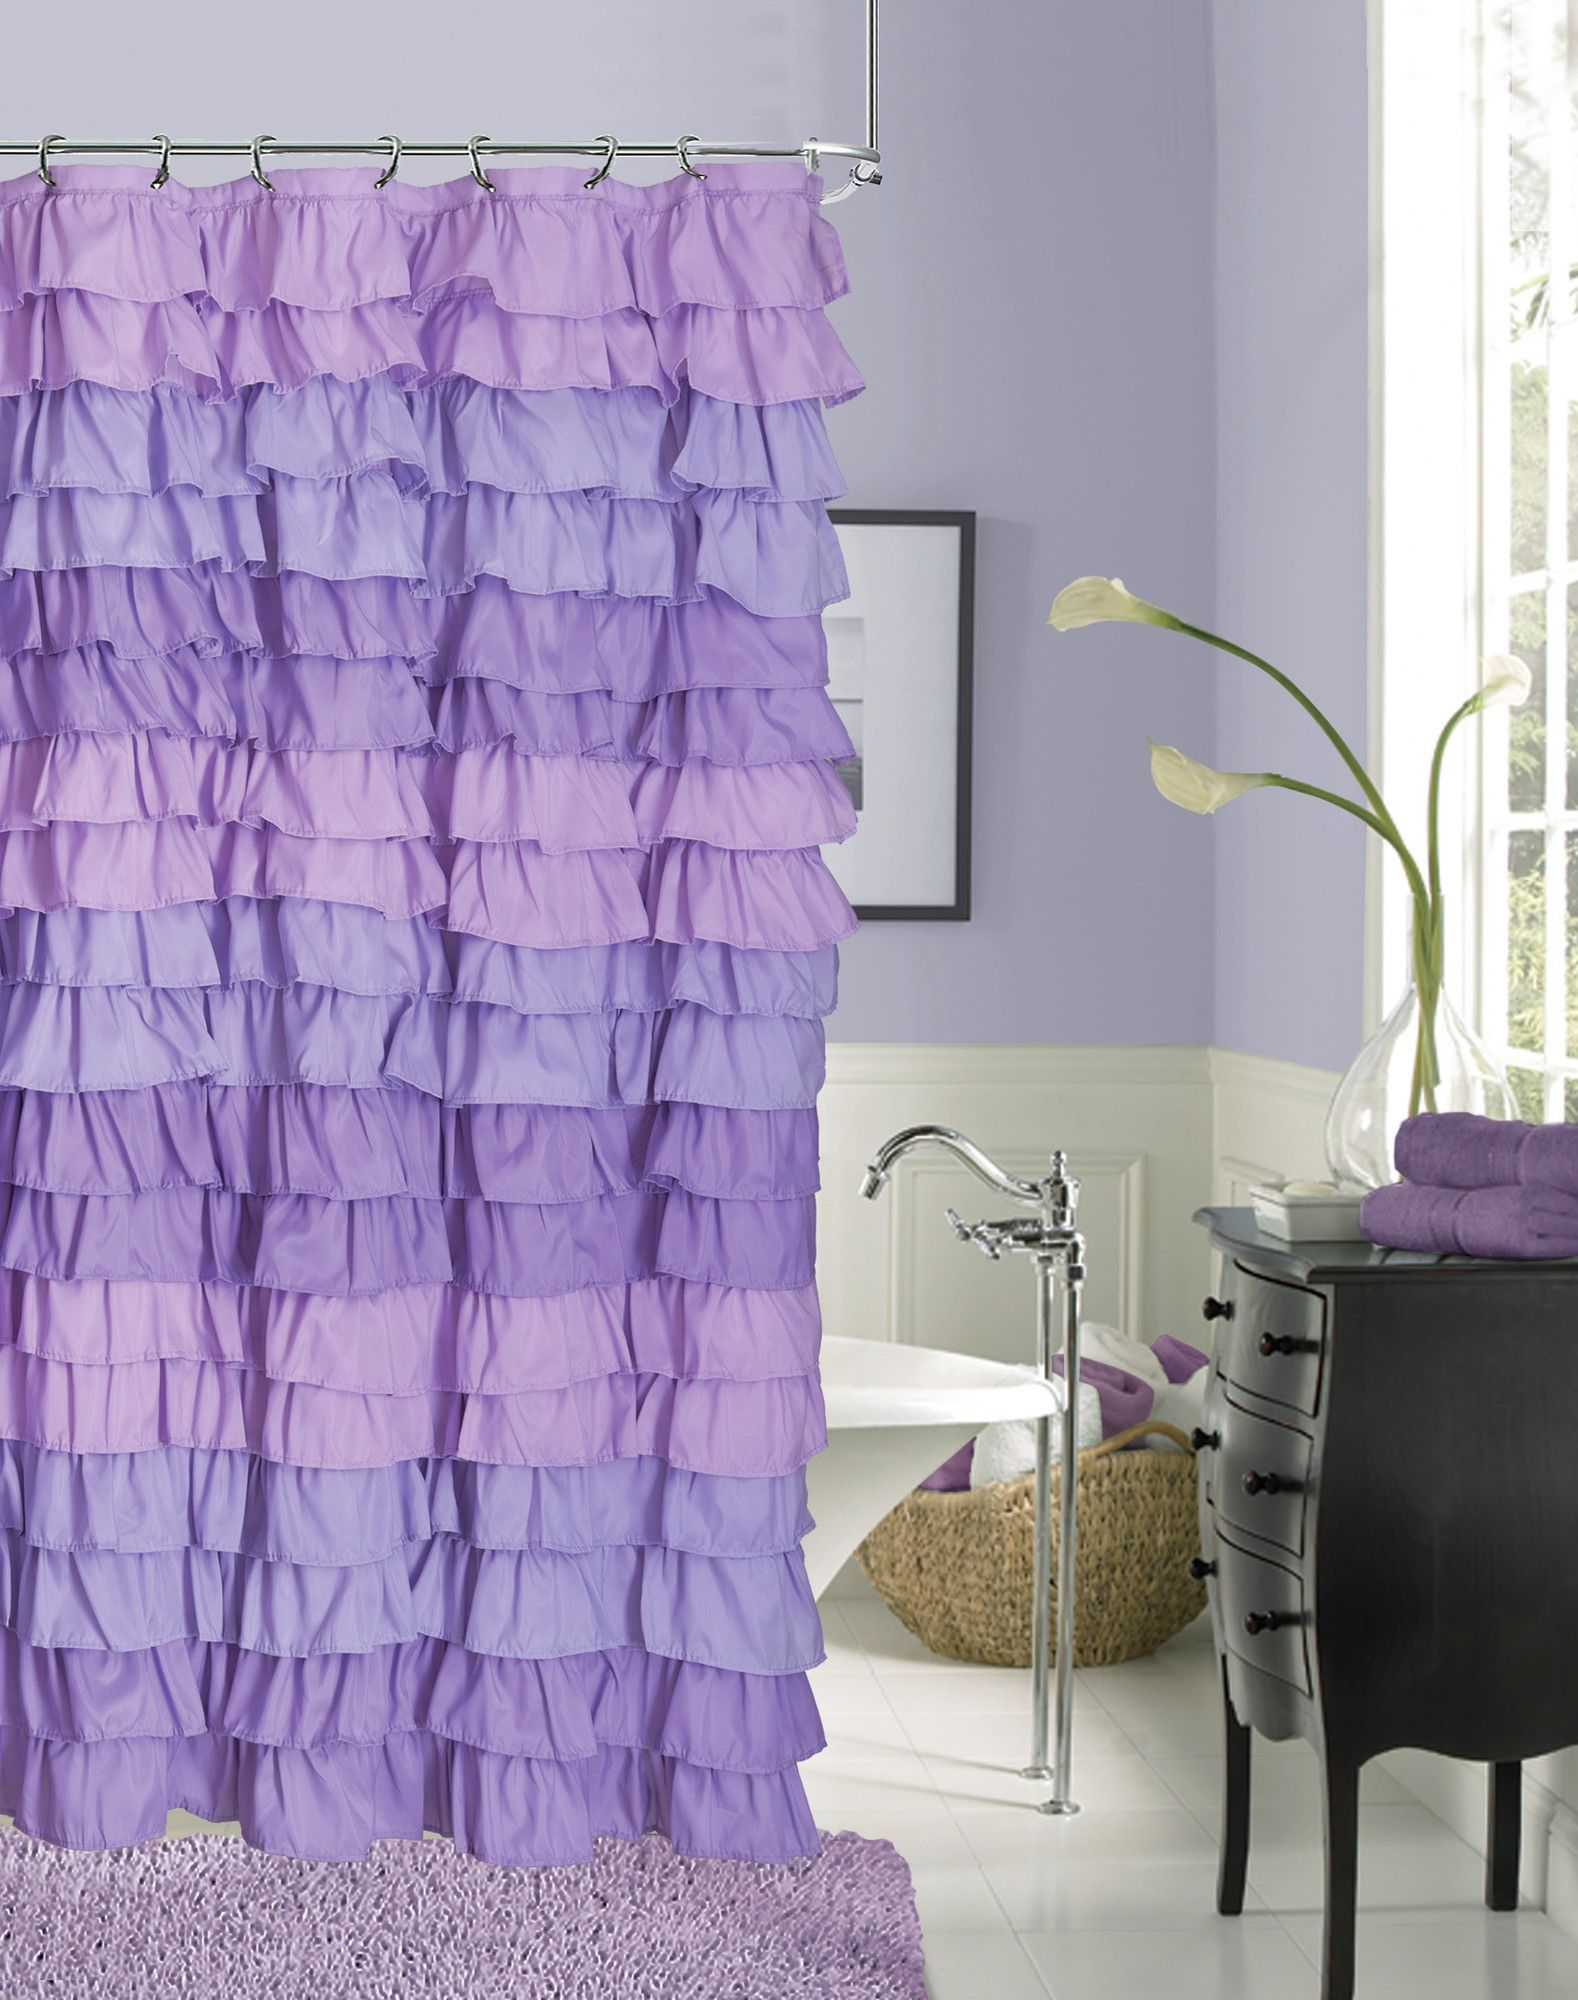 Venezia Ruffle Shower Curtain Products